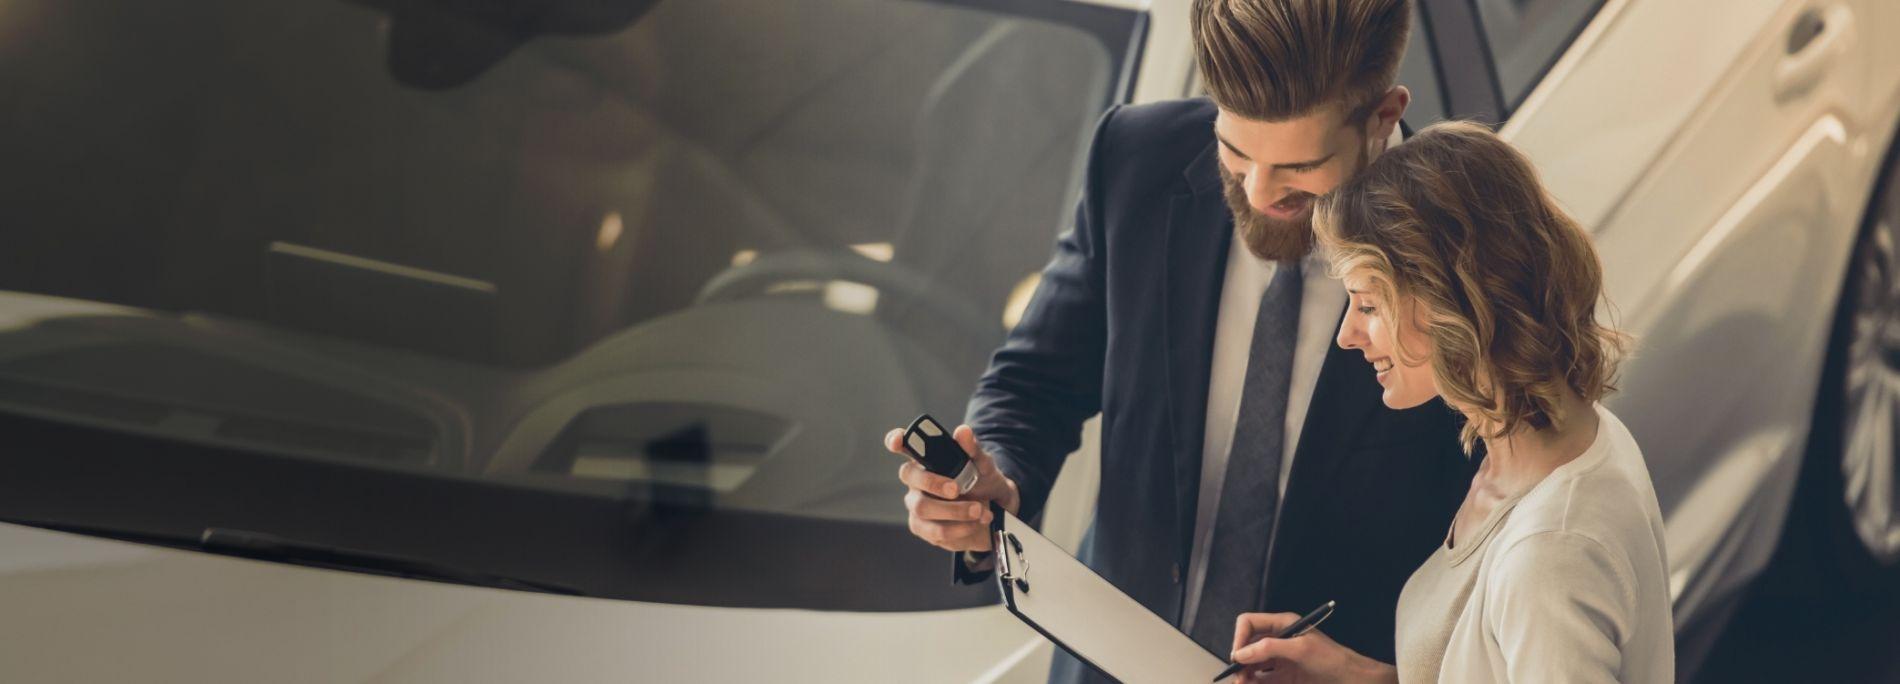 Кредит самозанятым на авто